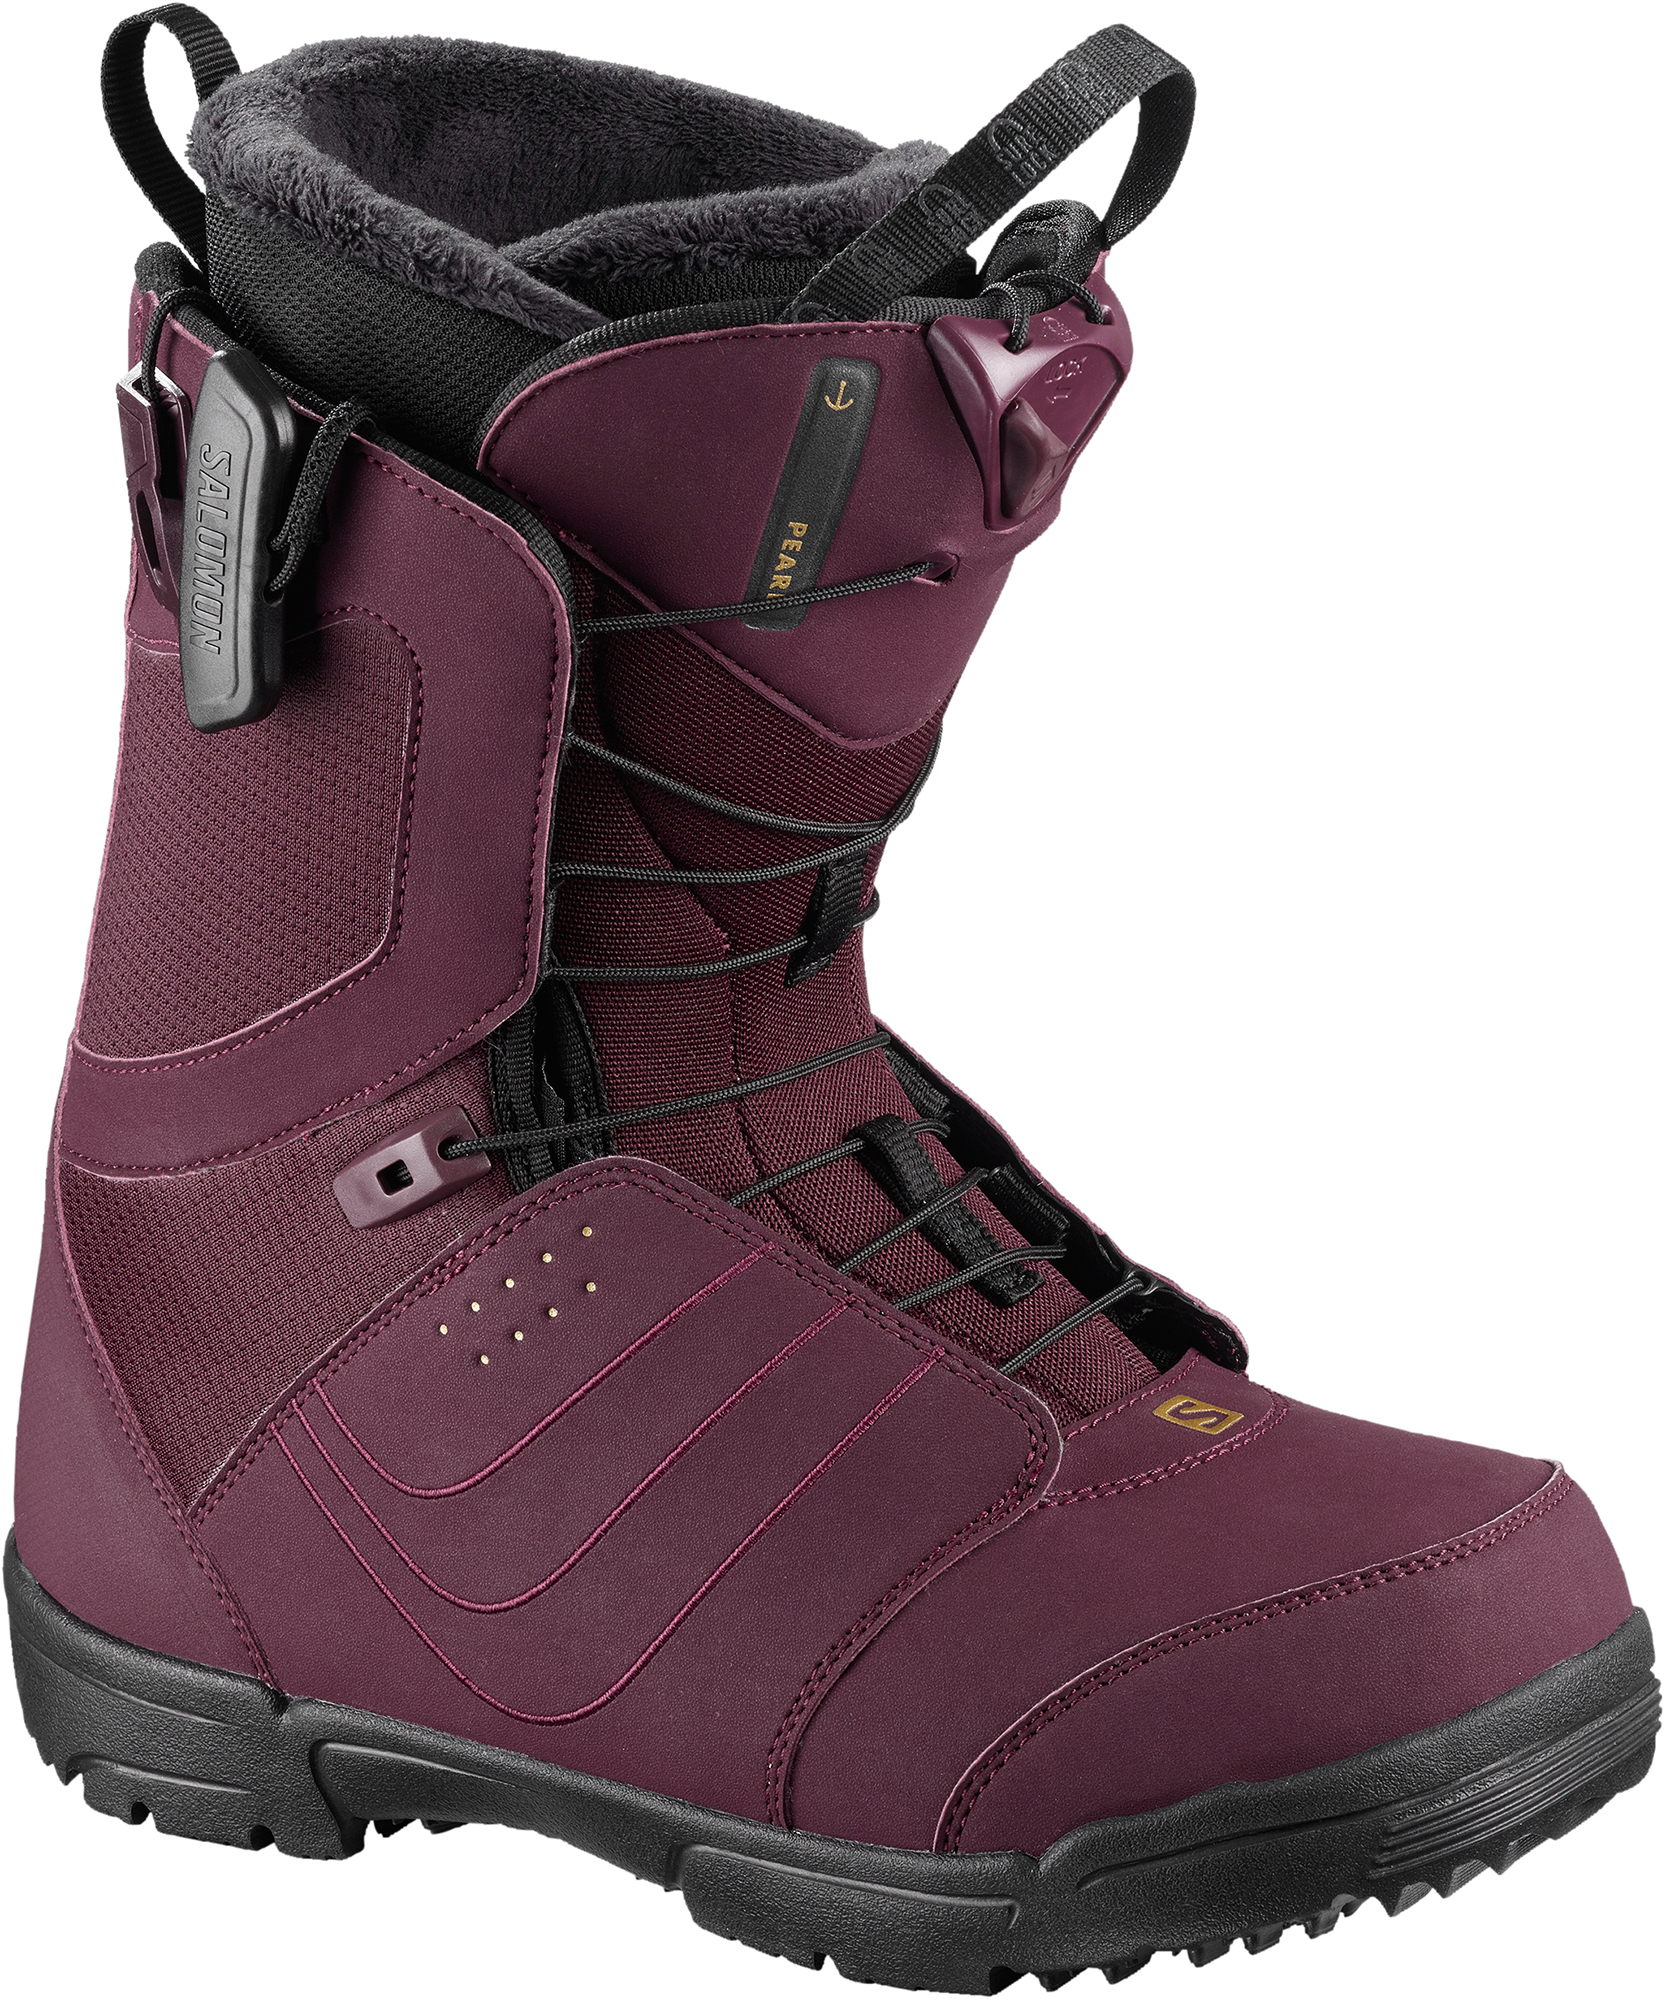 Salomon Сноубордические ботинки женские Salomon Pearl, размер 38